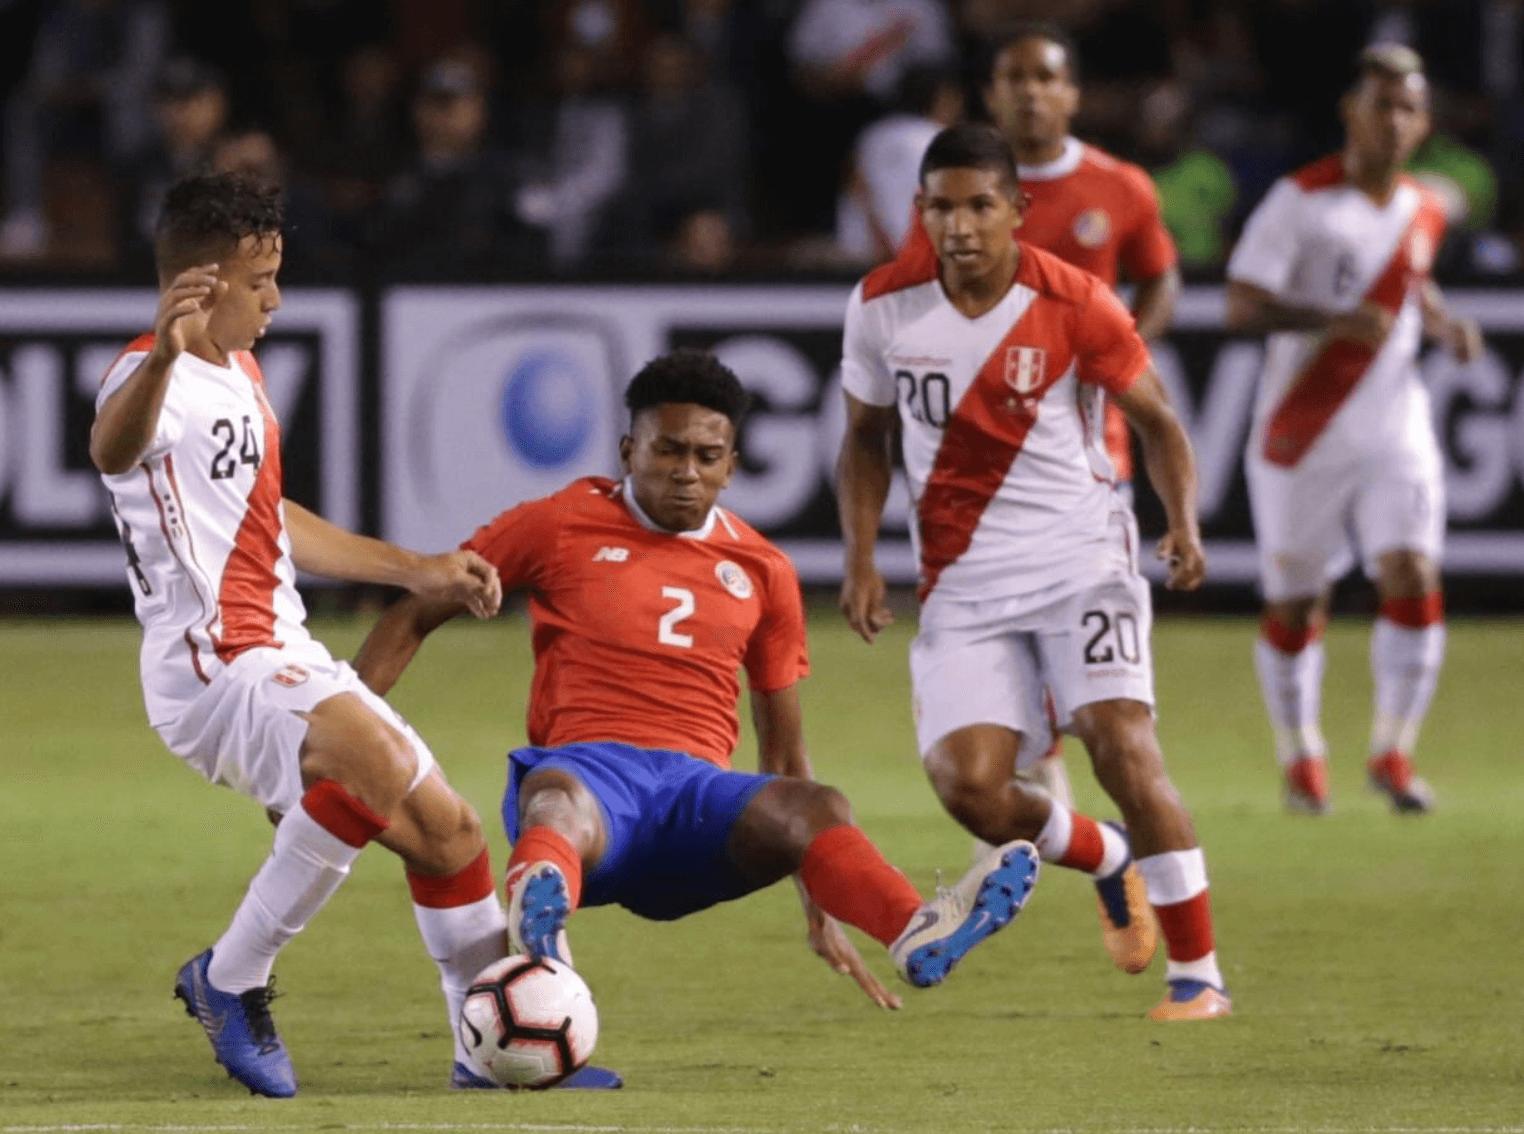 Peru comes up short to Costa Rica 3-2